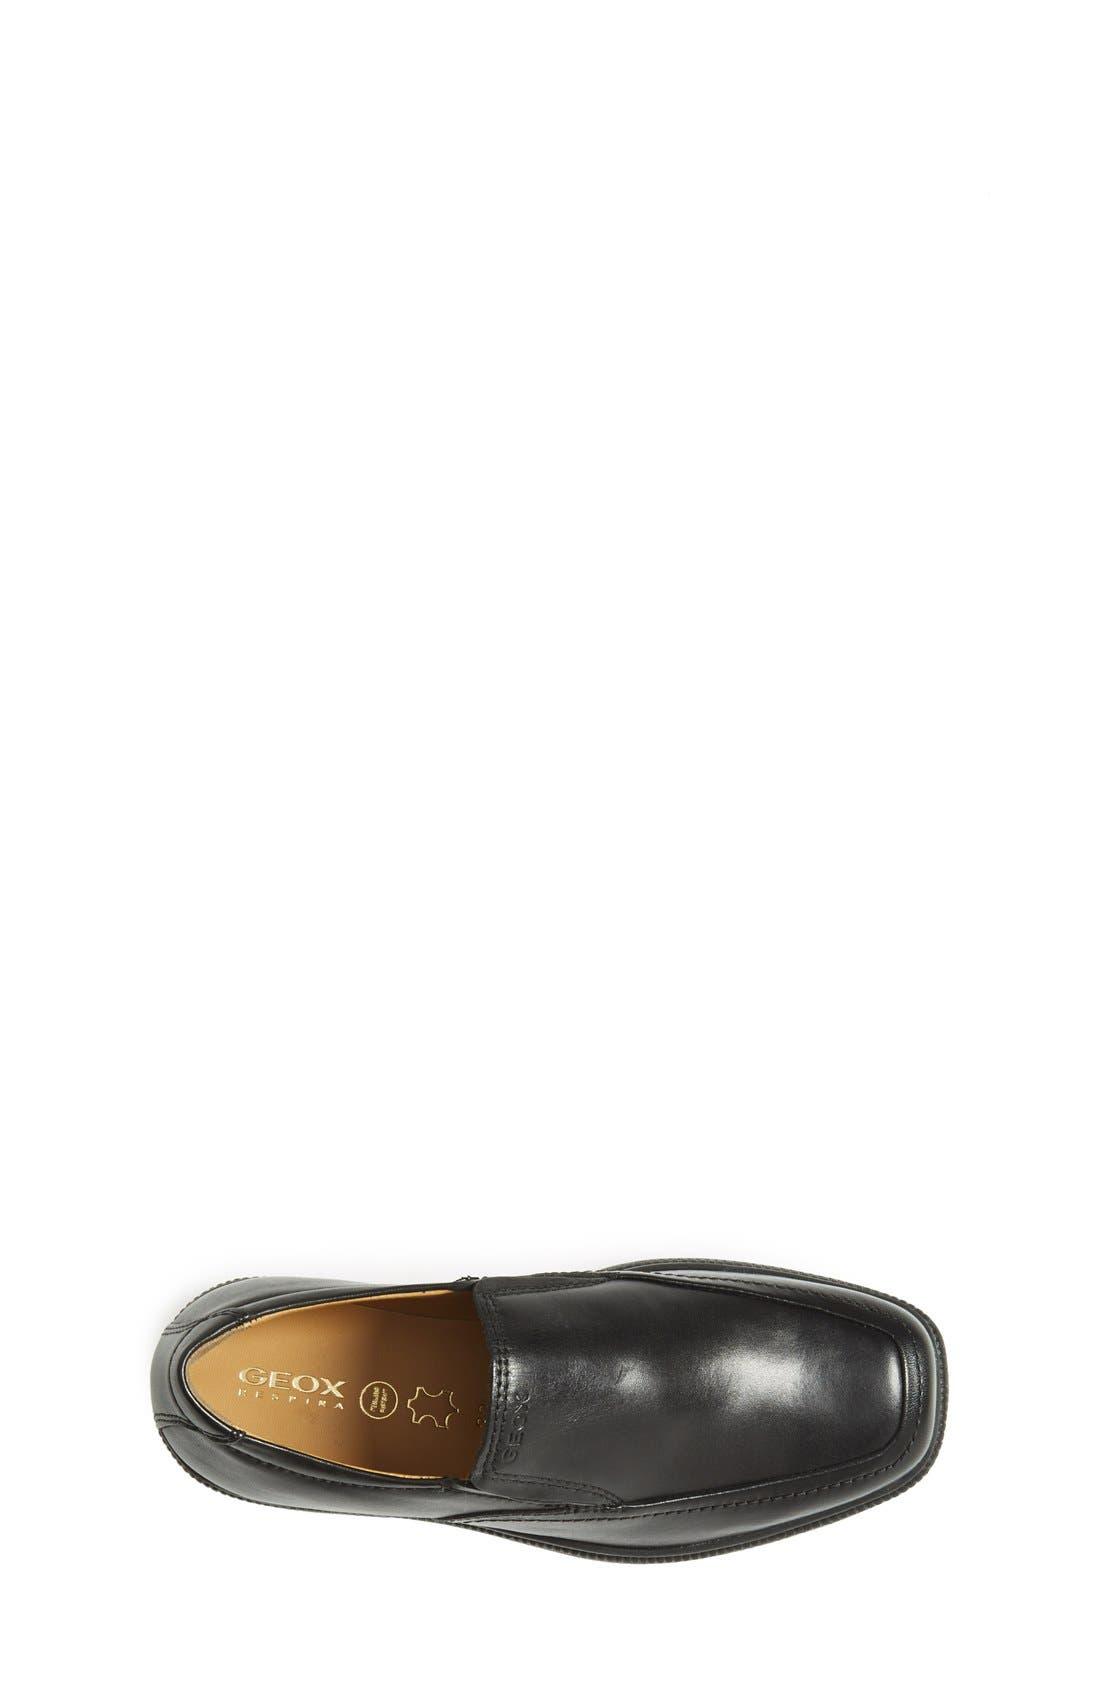 'Federico' Loafer,                             Alternate thumbnail 3, color,                             Black